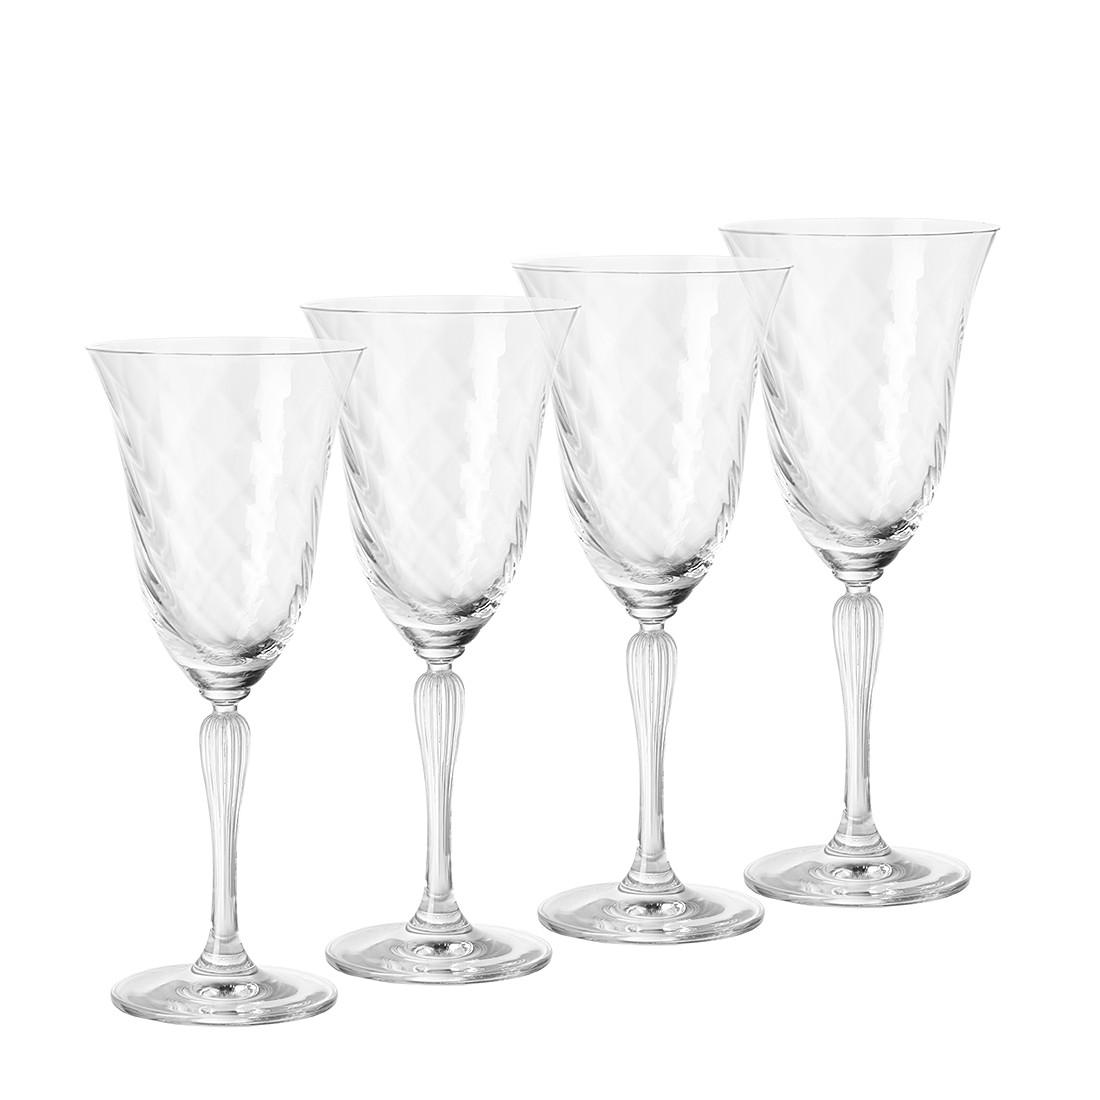 Rotweinglas Volterra (6er-Set), Leonardo online bestellen